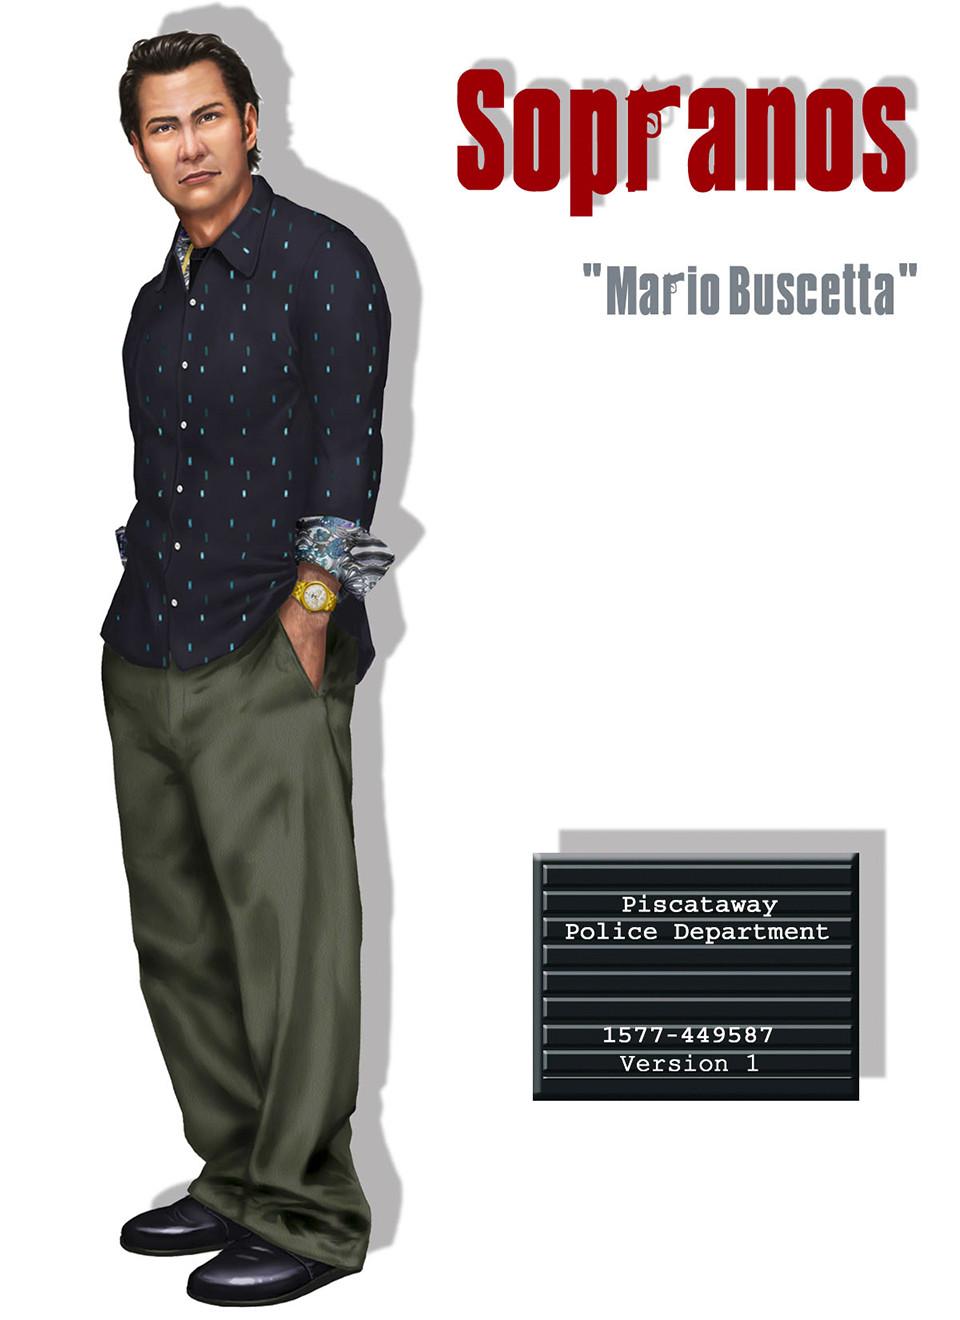 Jeff zugale sop philly mario buscetta2